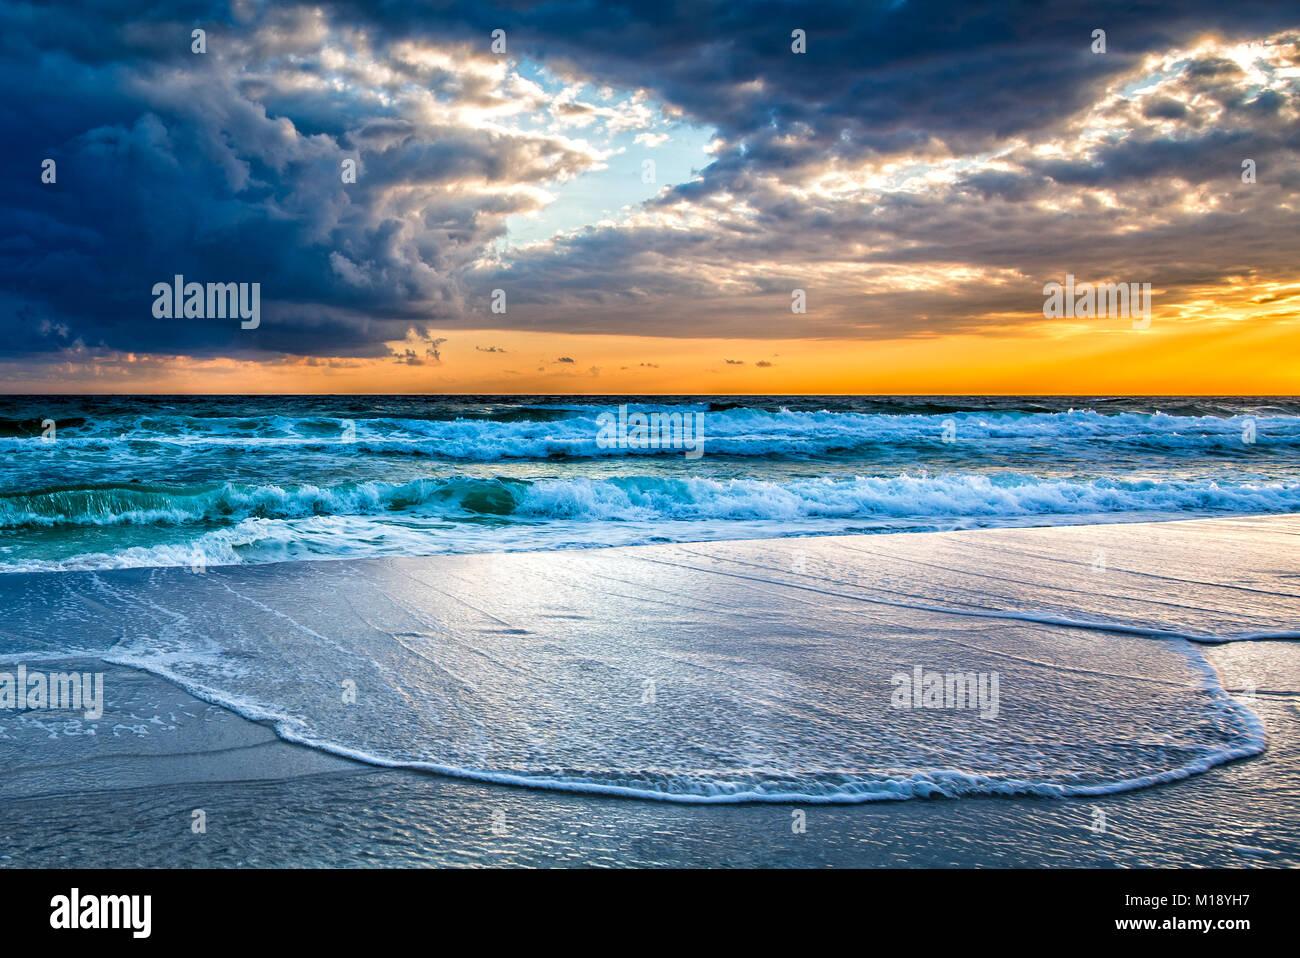 Stormy Sunset Destin - Stock Image